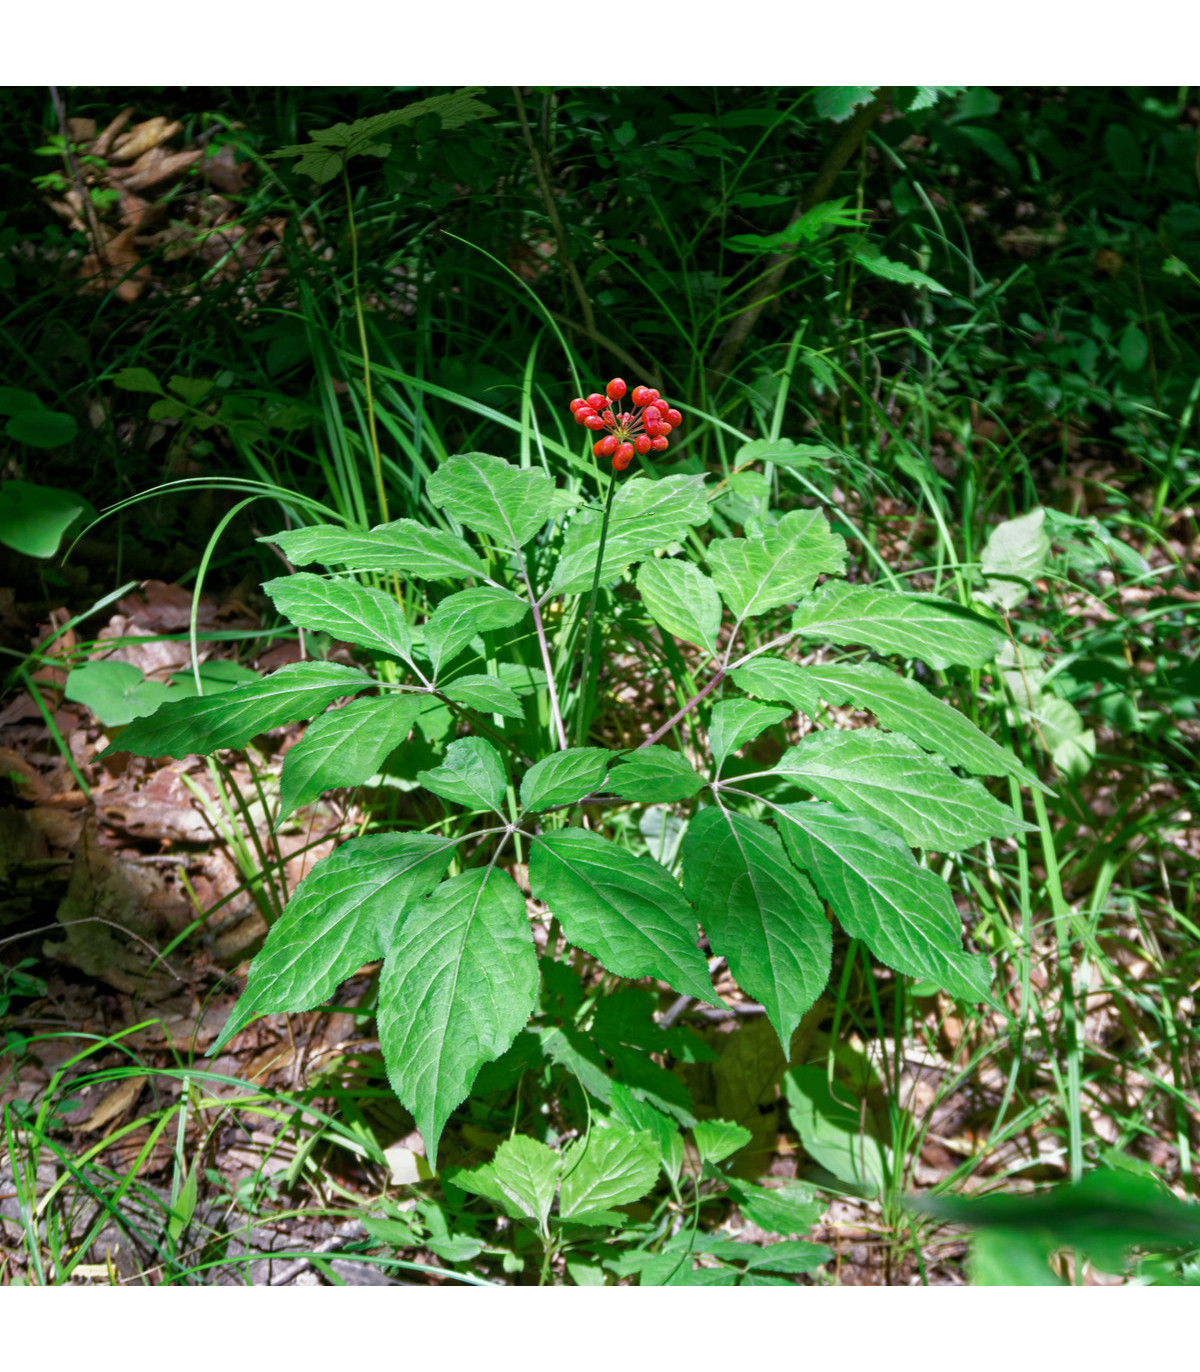 Ženšen pravý - Ginseng - semena Ženšenu - Panax ginseng - 2 ks